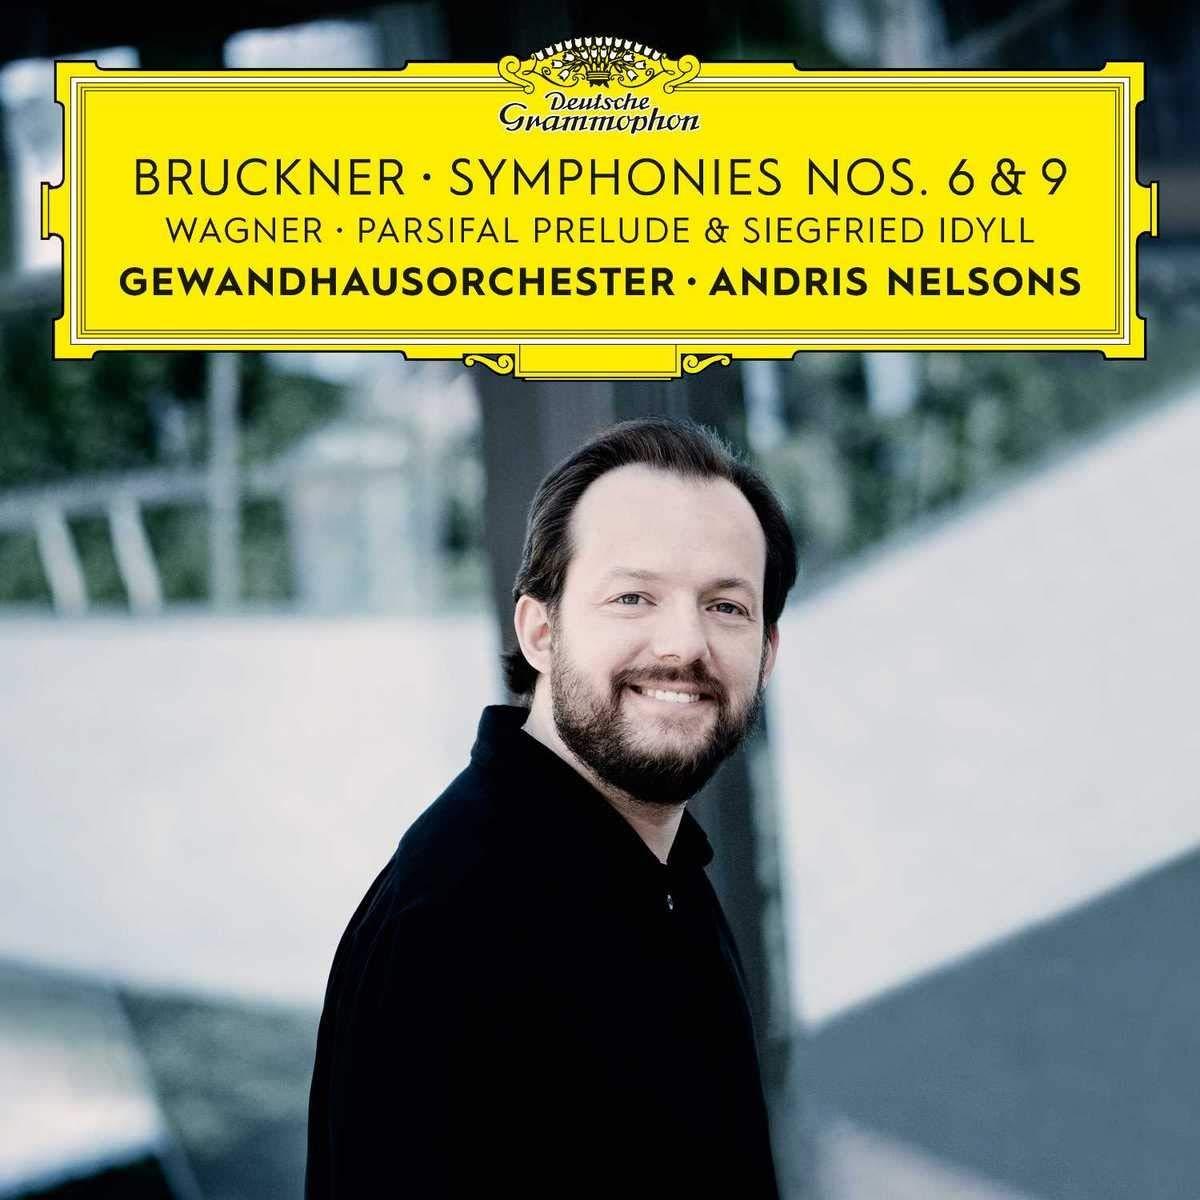 Bruckner : symphonies 6 & 9